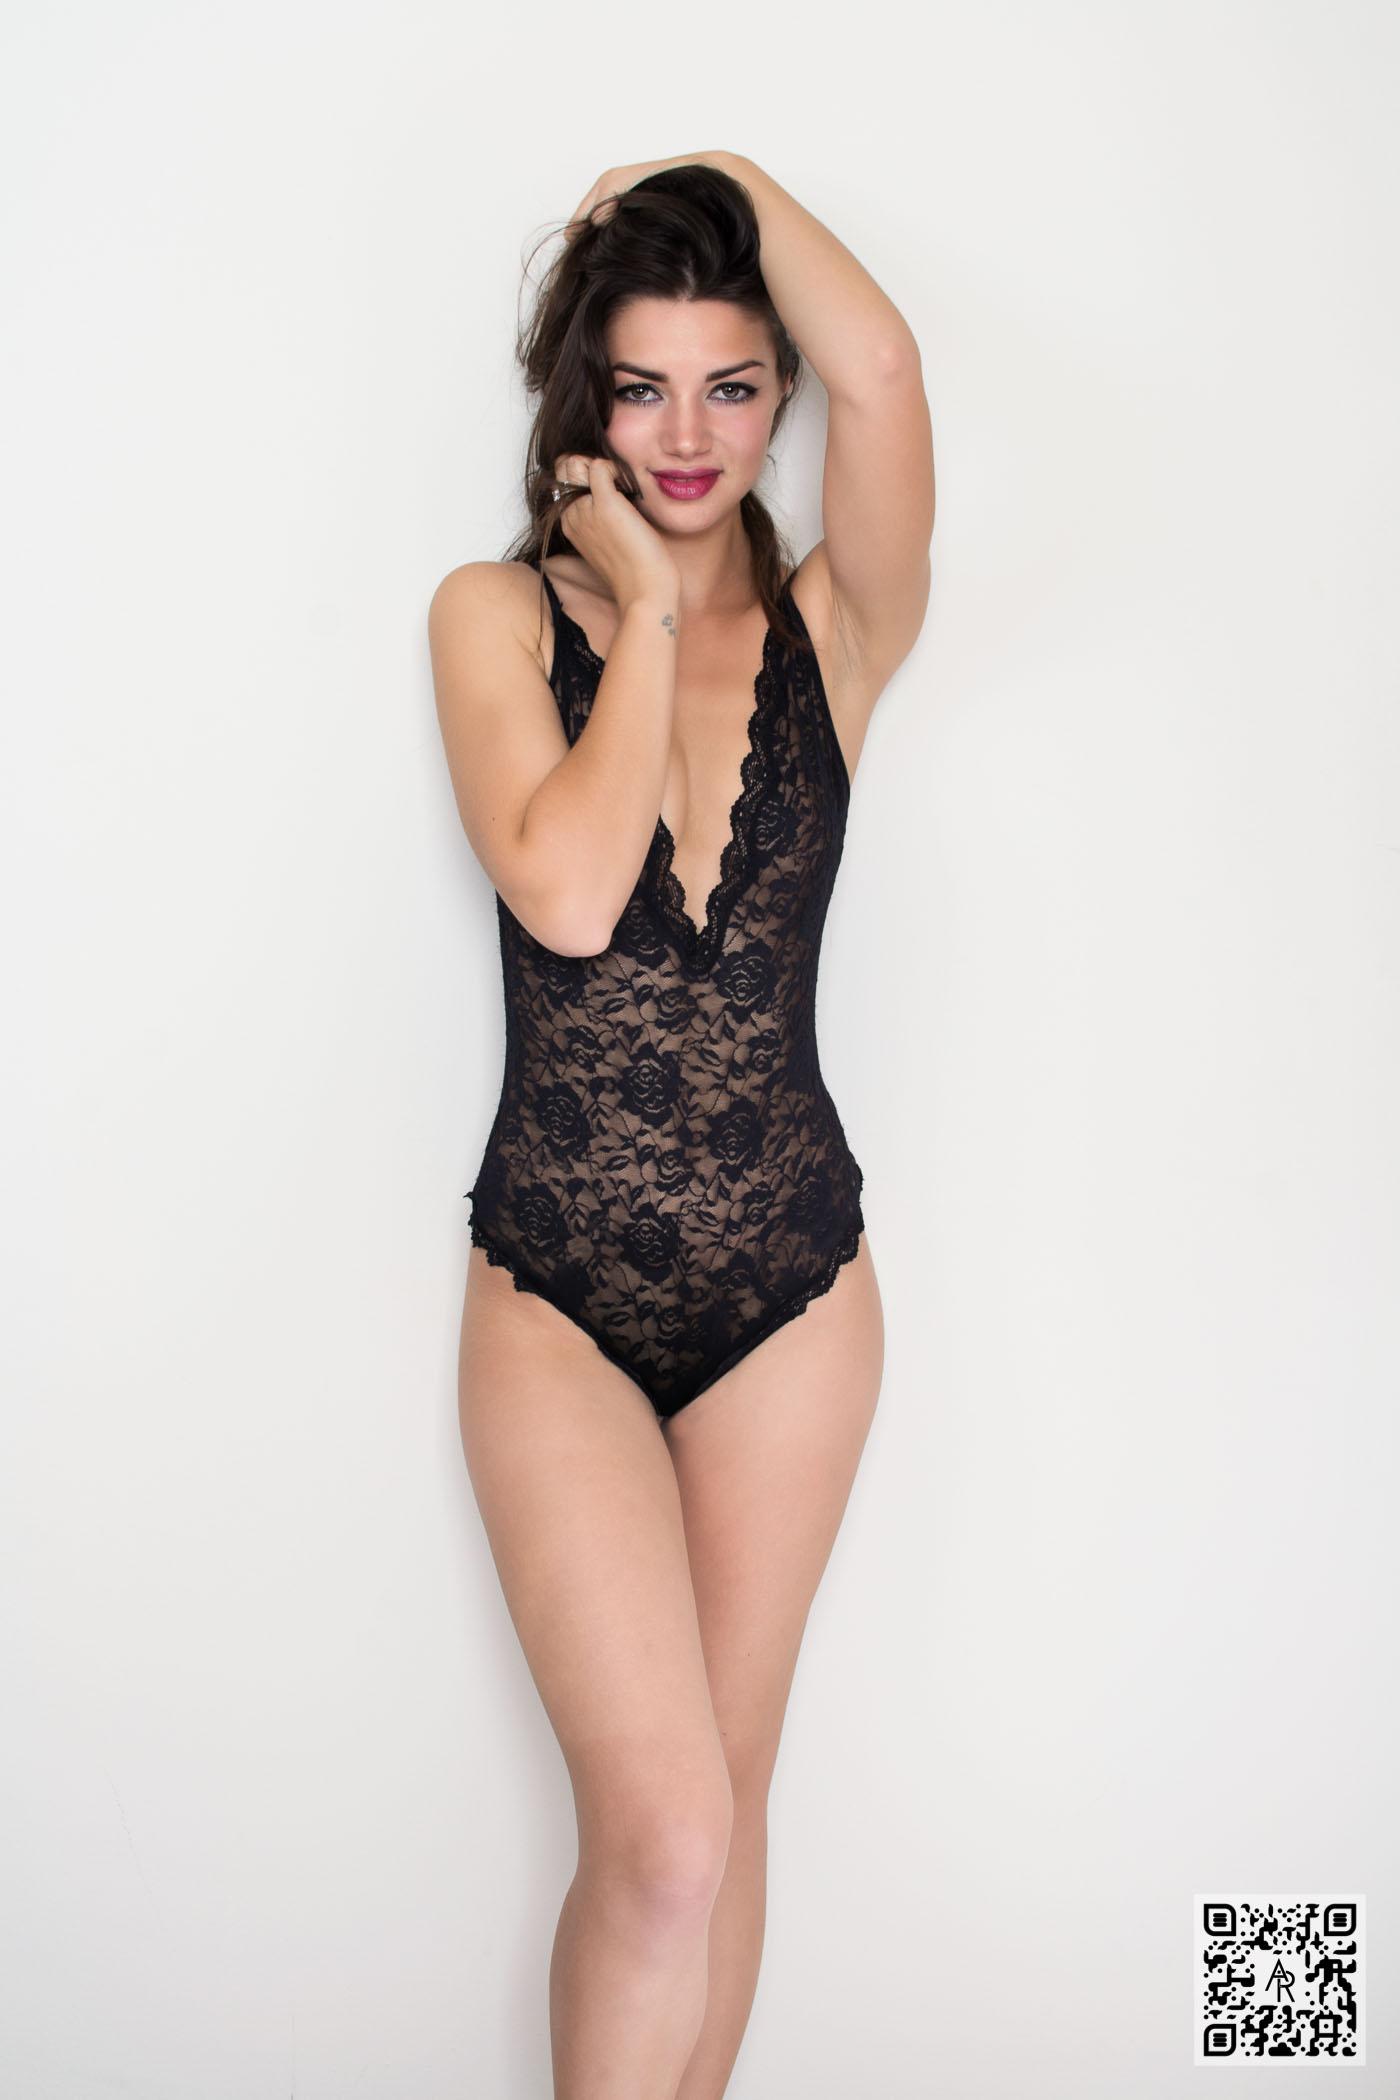 (M) Larisa C - Black Lace - Aaron Roberts Photographer